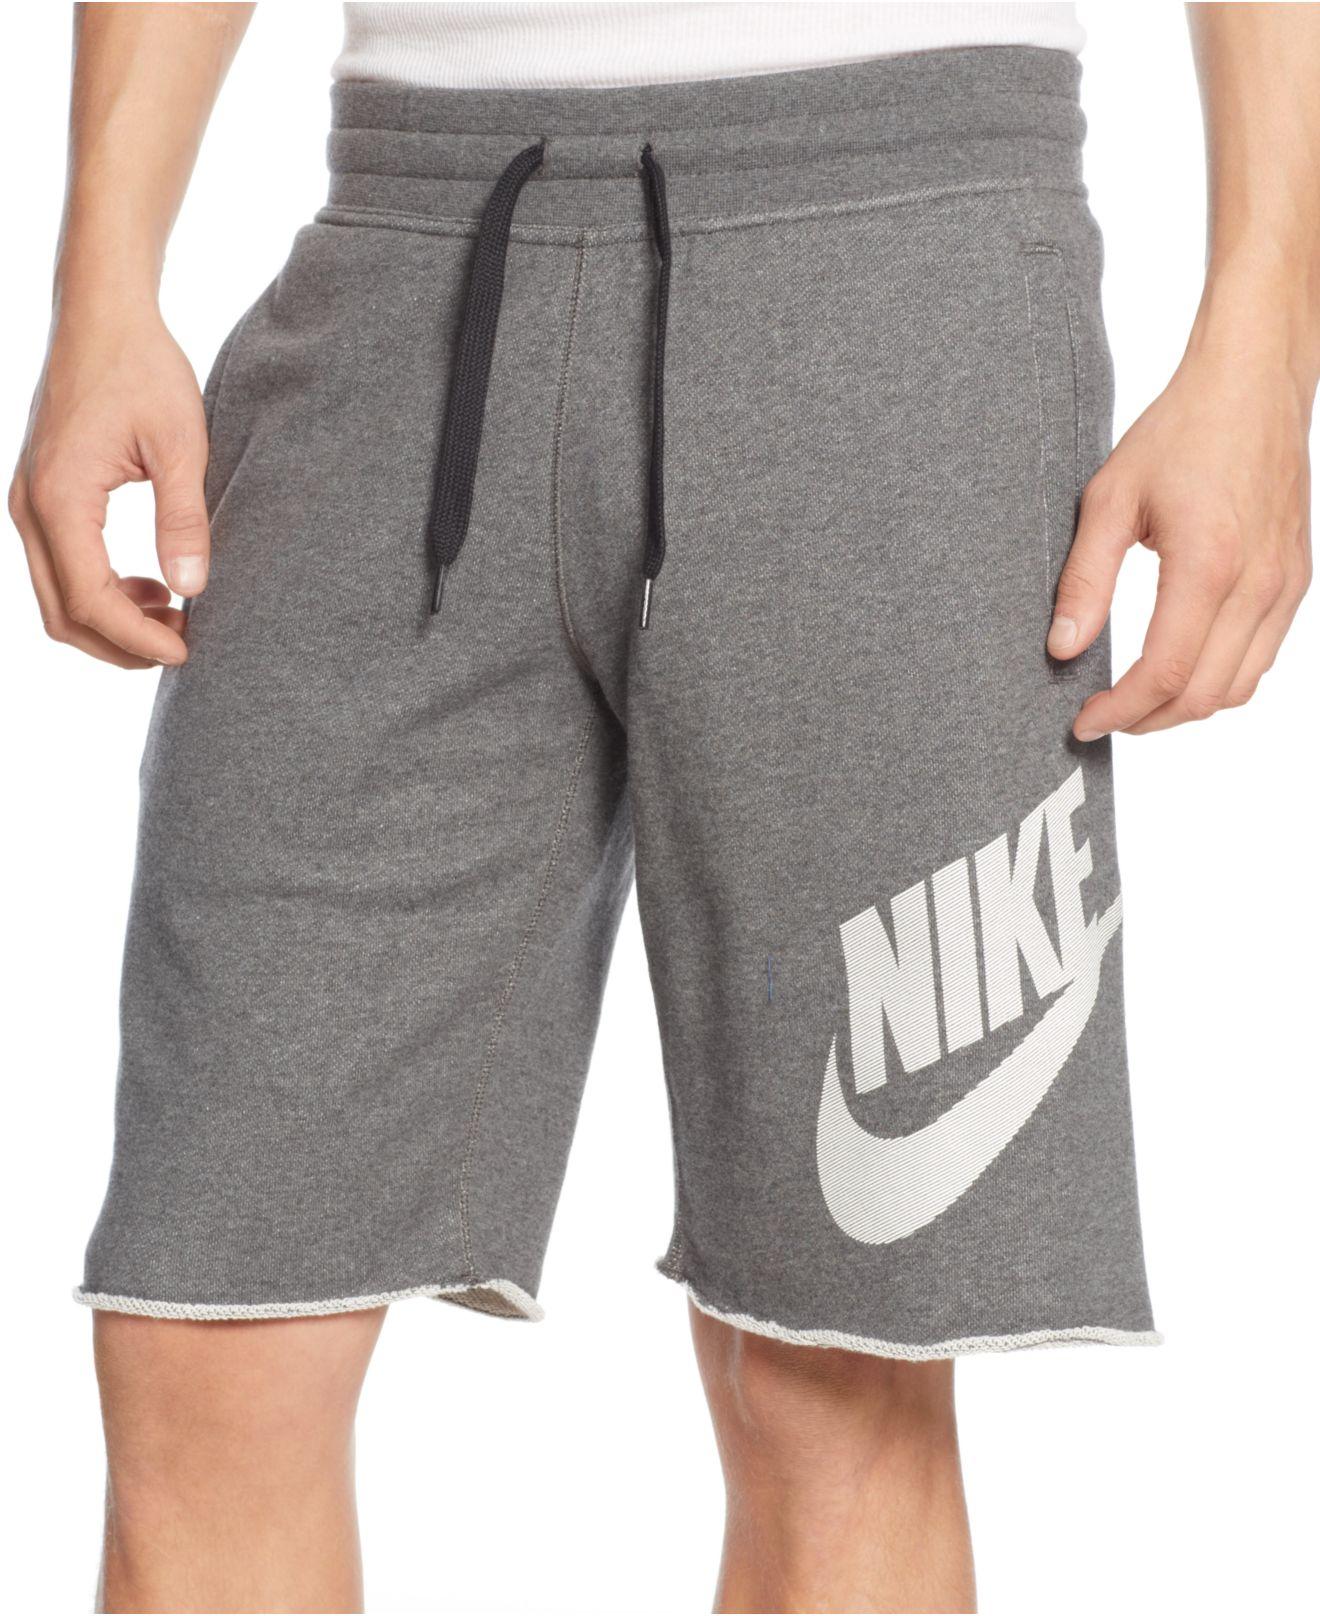 Nike Shorts Men Cotton unit4motors.co.uk 1c56cce490c6